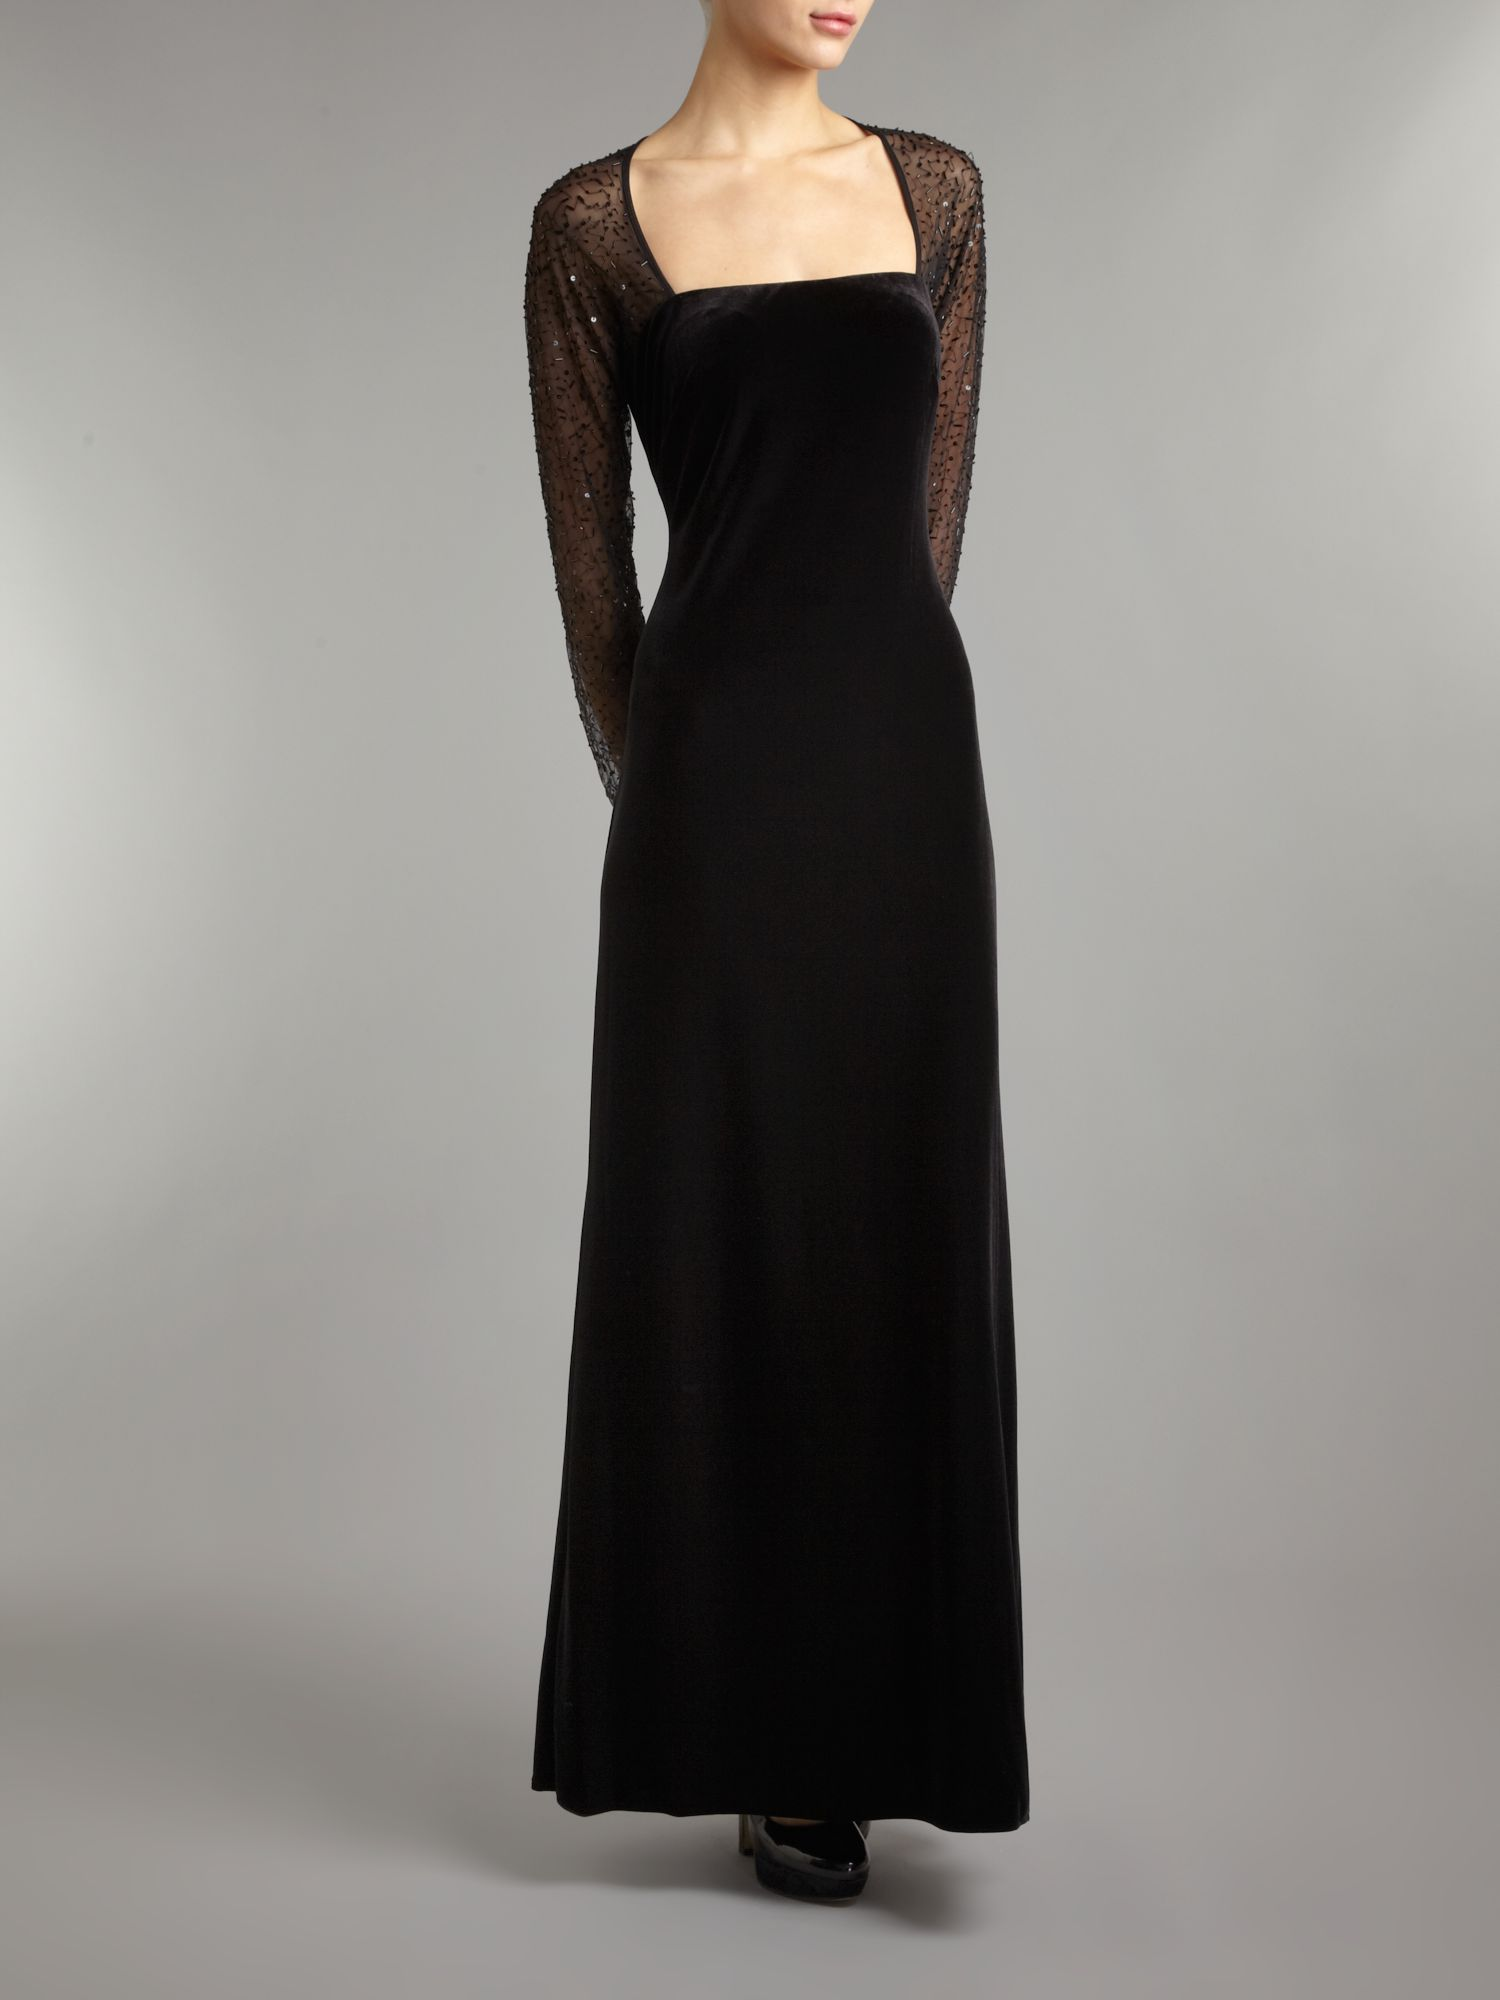 Js Collections Long Sleeve Velvet Beaded Mesh Maxi Dress